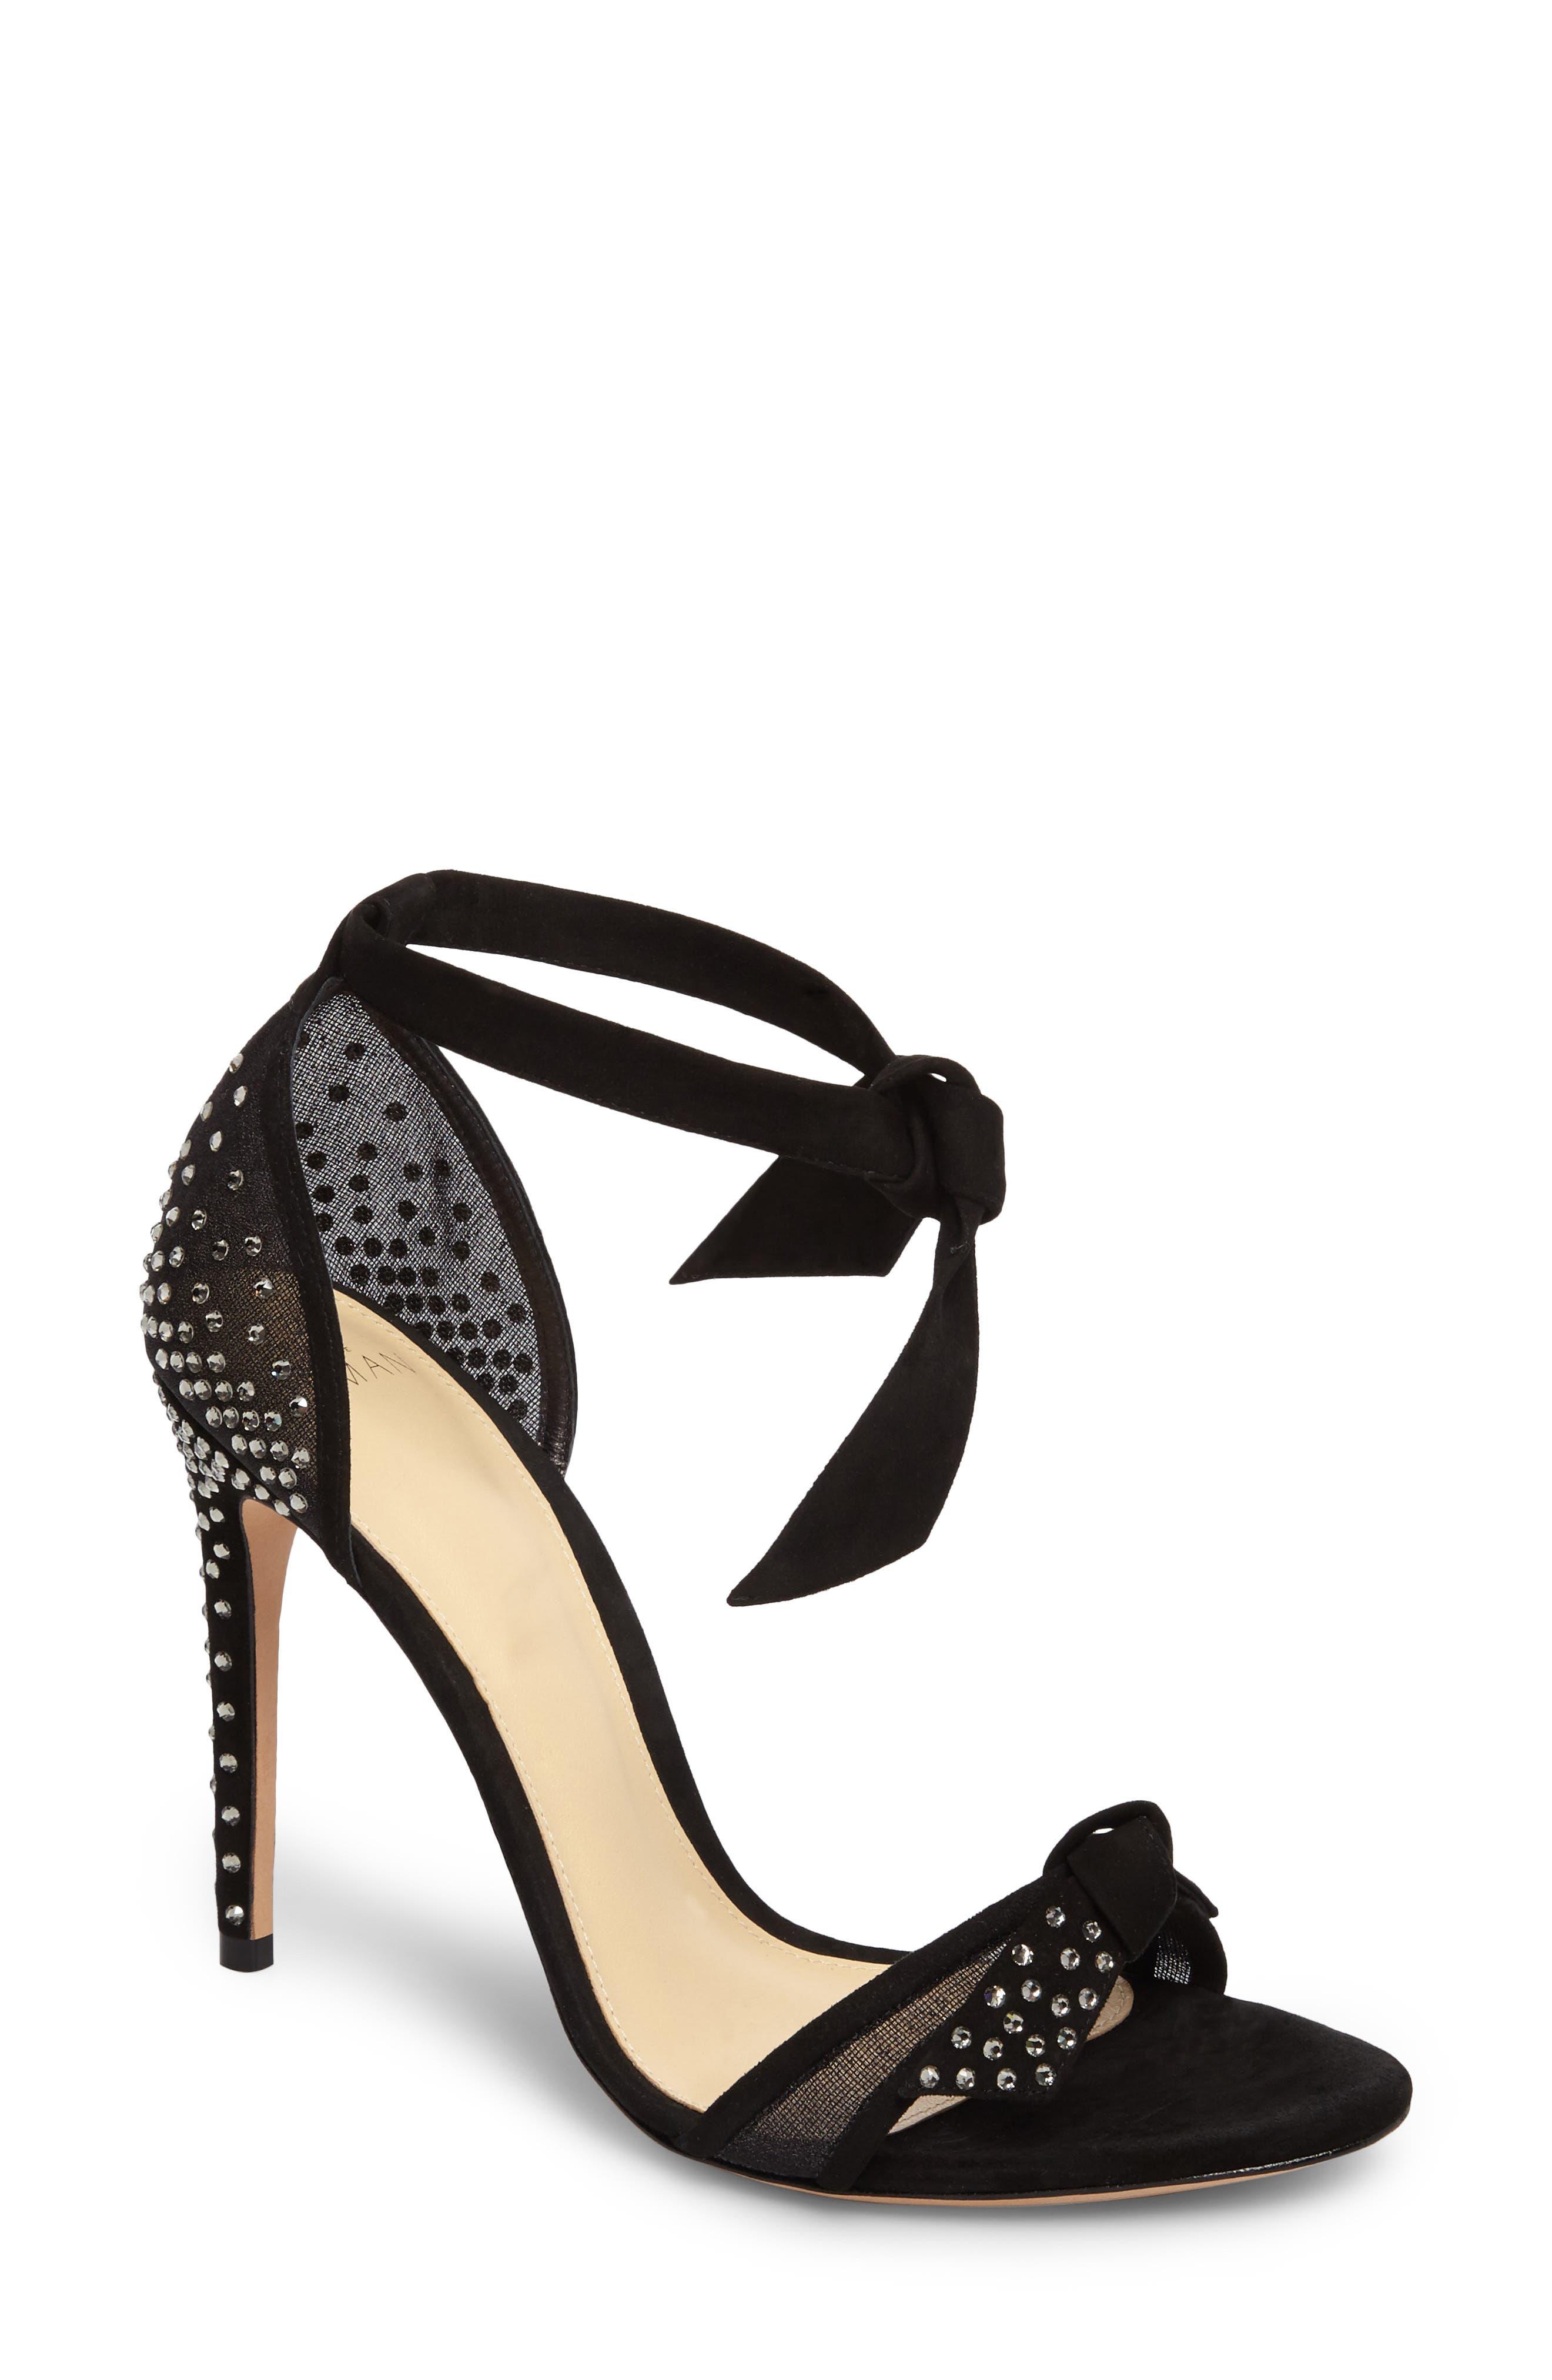 Clarita Stars Sandal,                         Main,                         color, Black